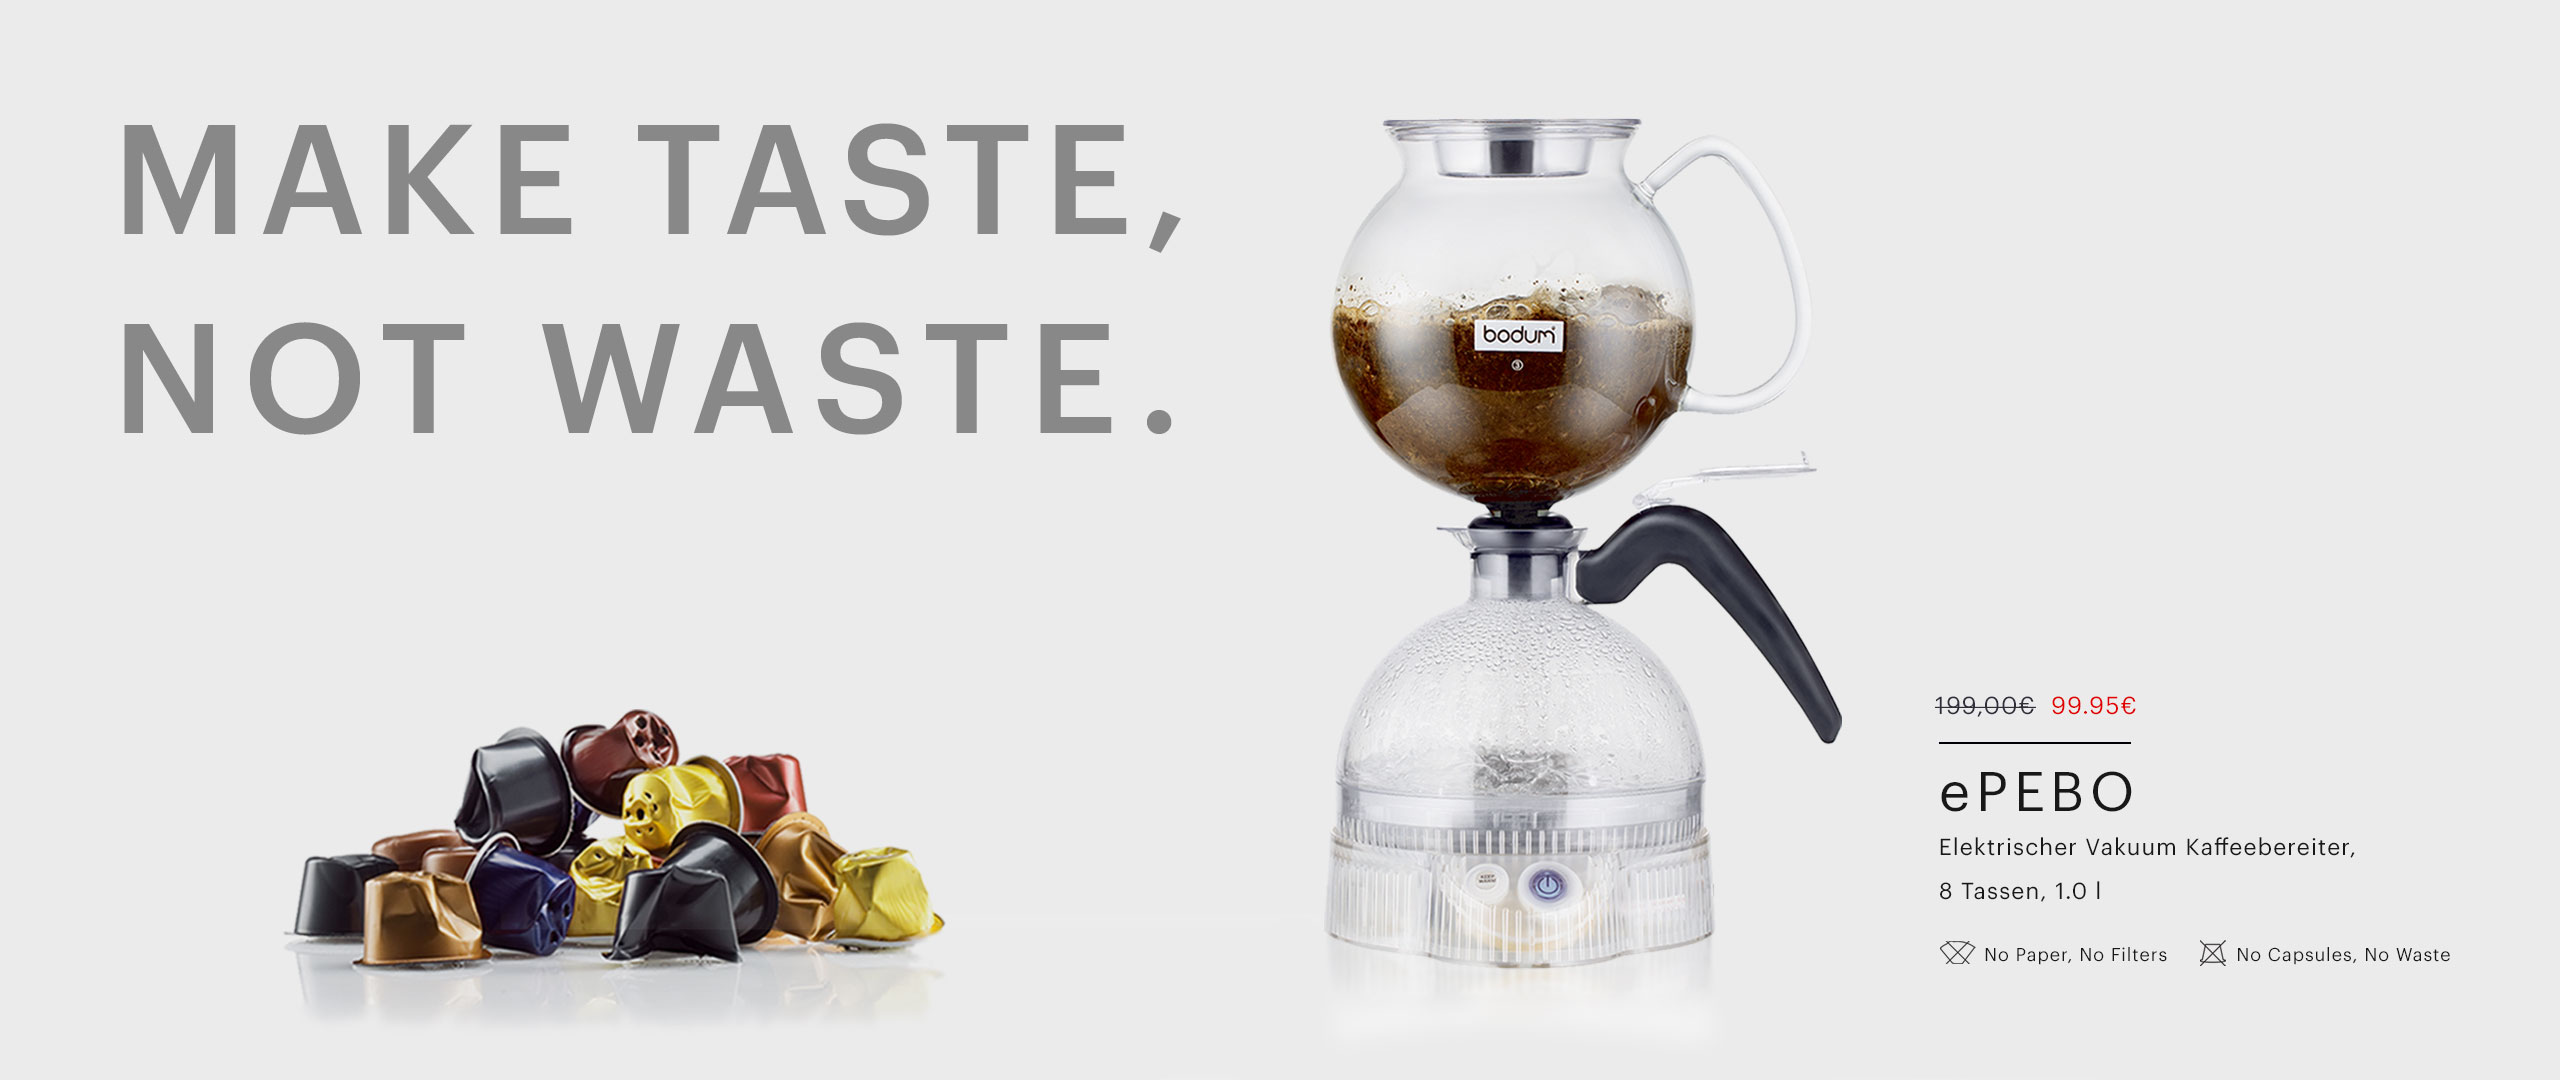 BEU [DE] - Make Taste Not Waste ePEBO